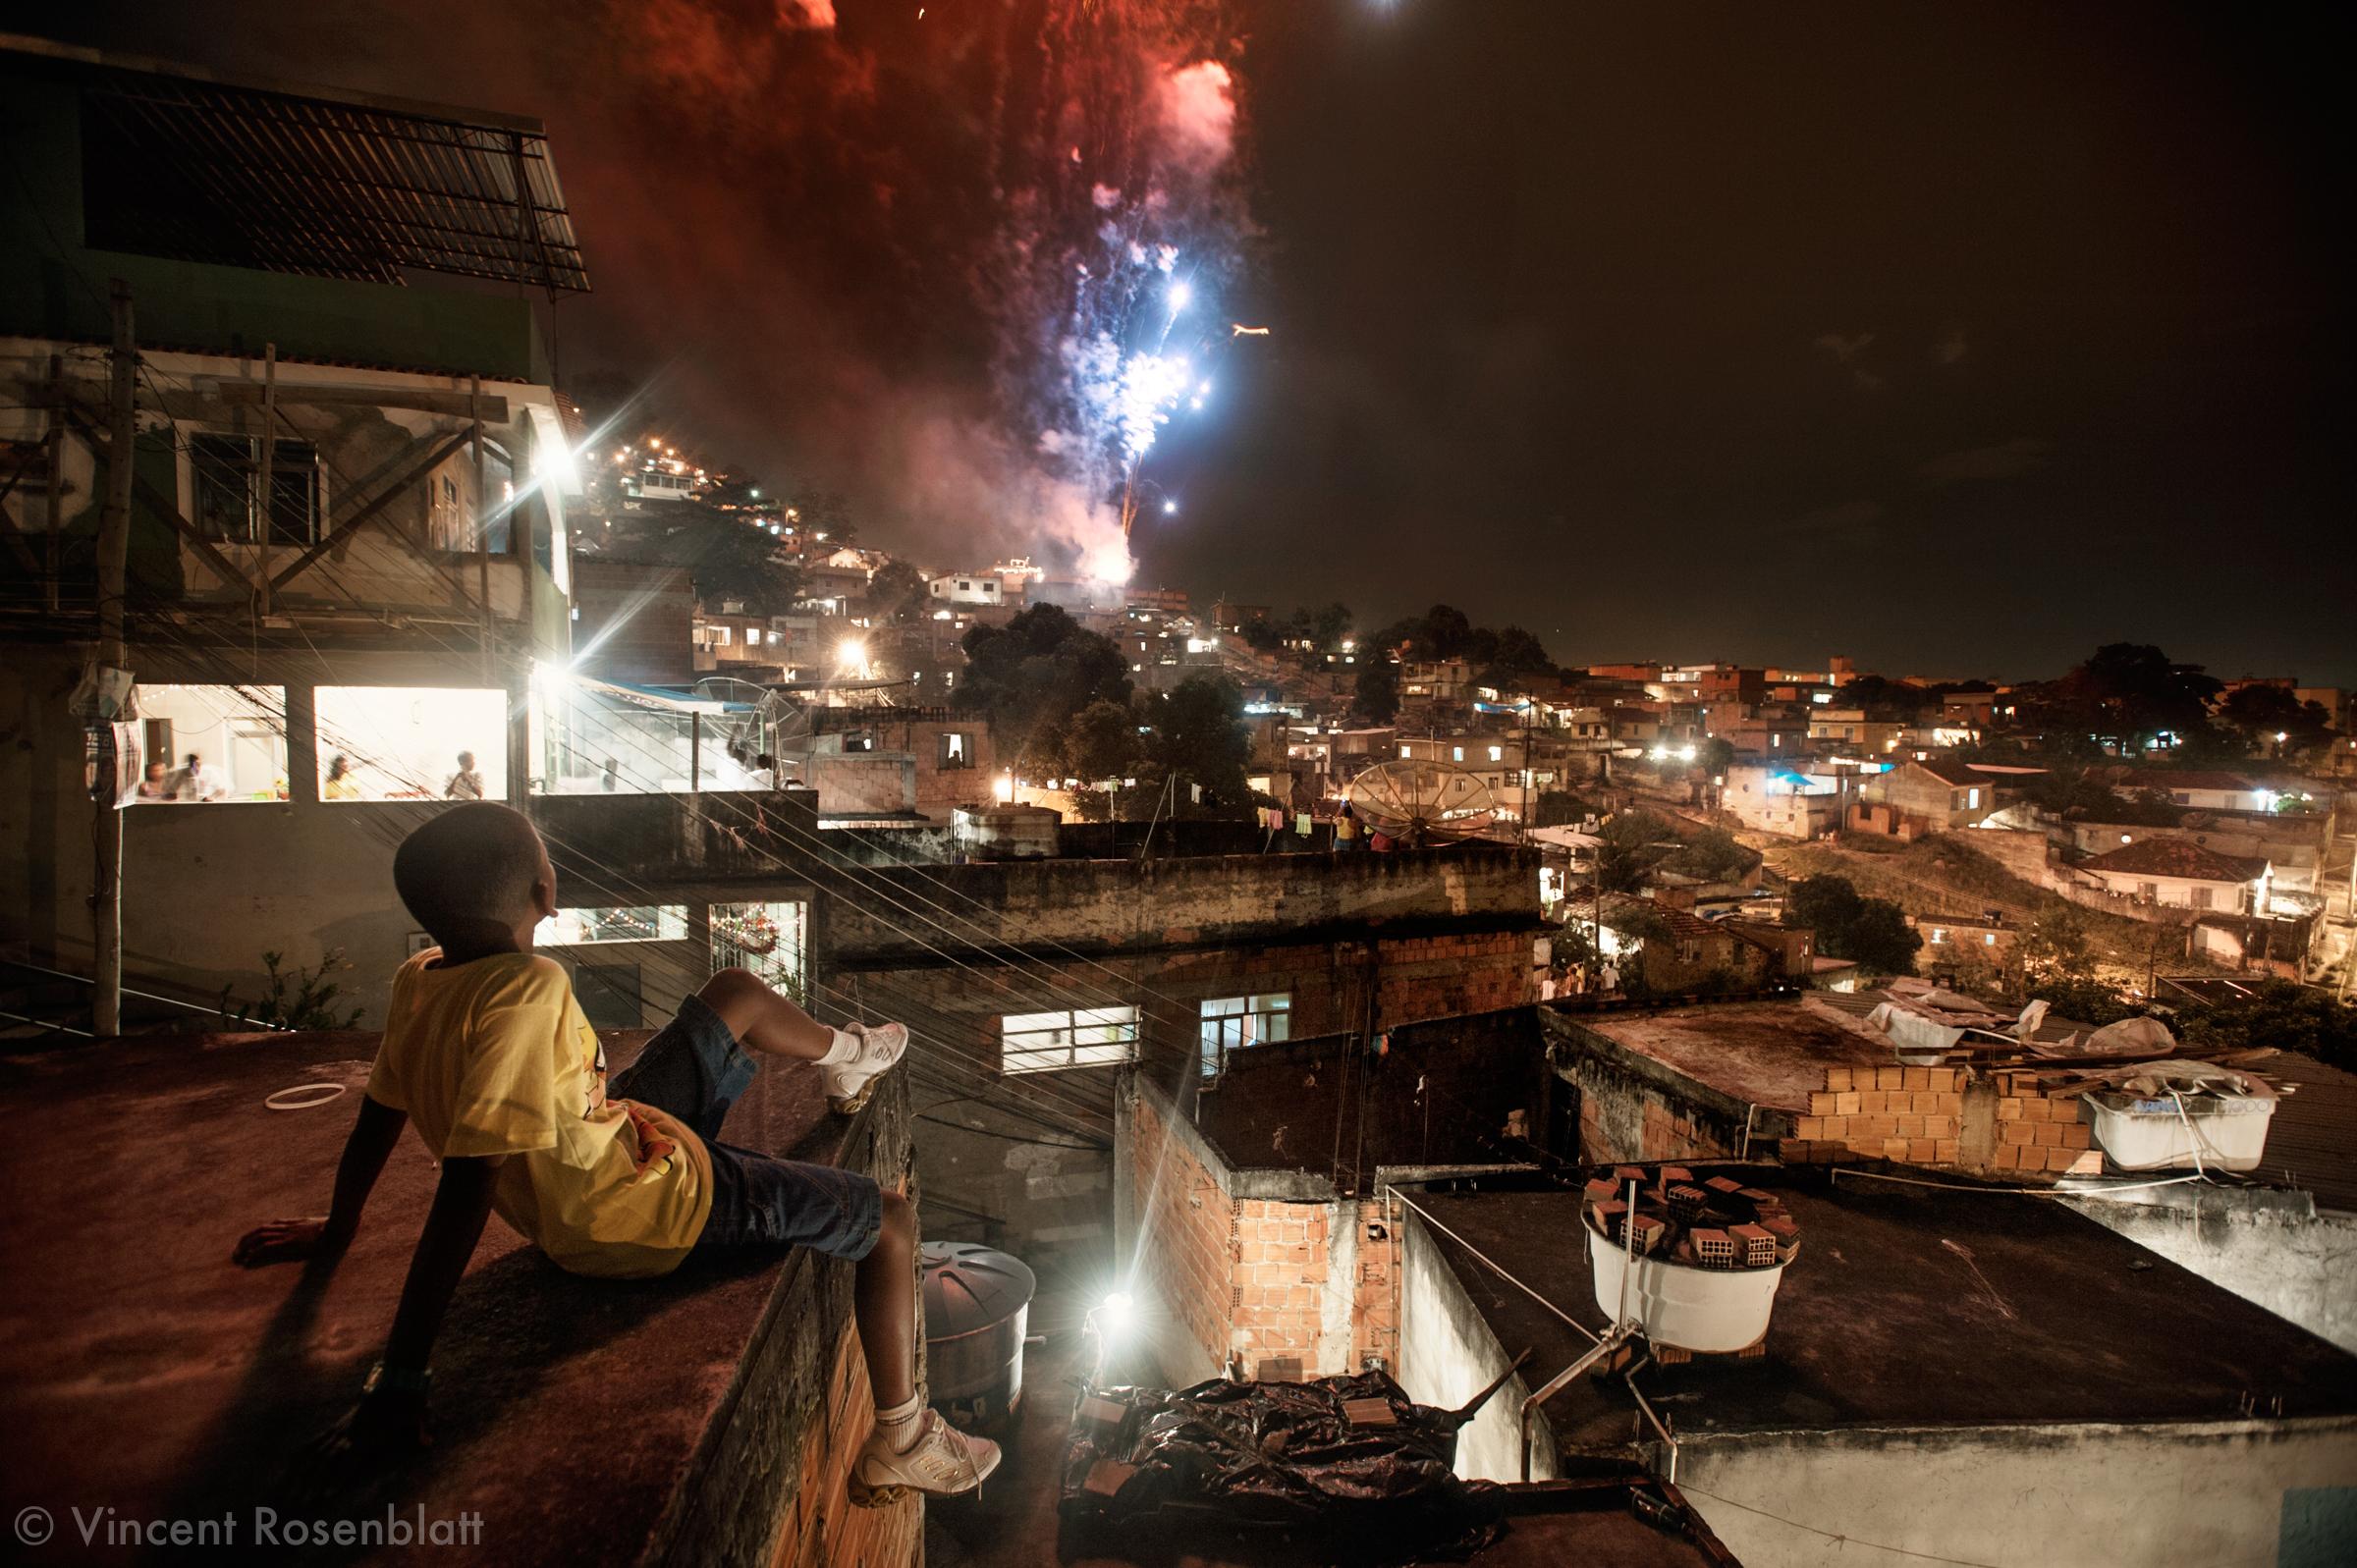 Revelhão no morro da Arvore Seca, Complexo do Lins, Rio de Janeiro. // New year's eve 2009 in the Complexo do Lins' favelas, Northern Area of Rio. Far from the beaches and Copacabana, the favelas treat themselves to their own fireworks.